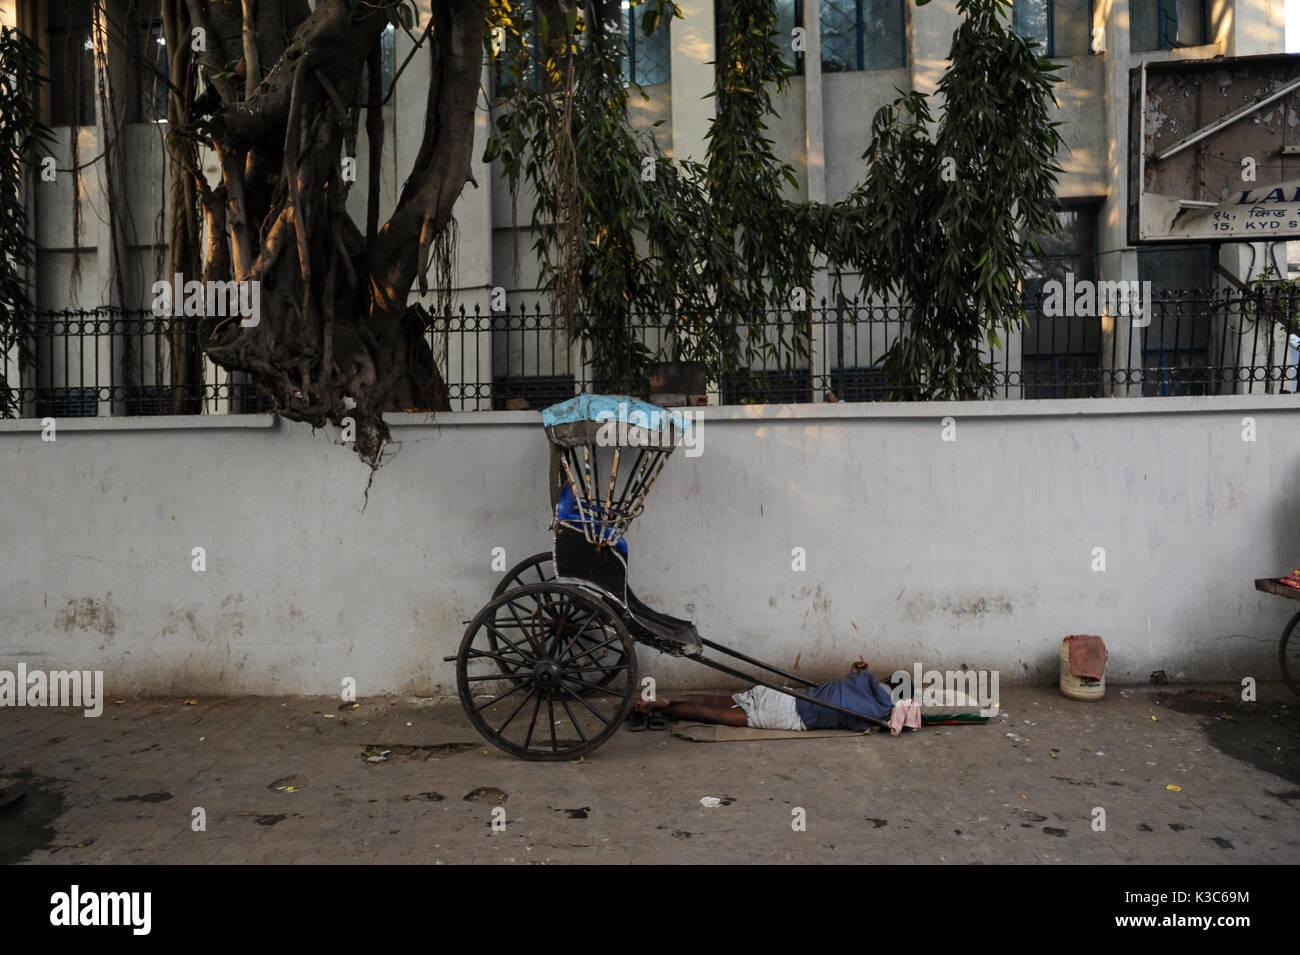 25.02.2011, Kolkata, West Bengal, India, Asia - A rickshaw puller sleeps next to his wooden rickshaw at a roadside - Stock Image